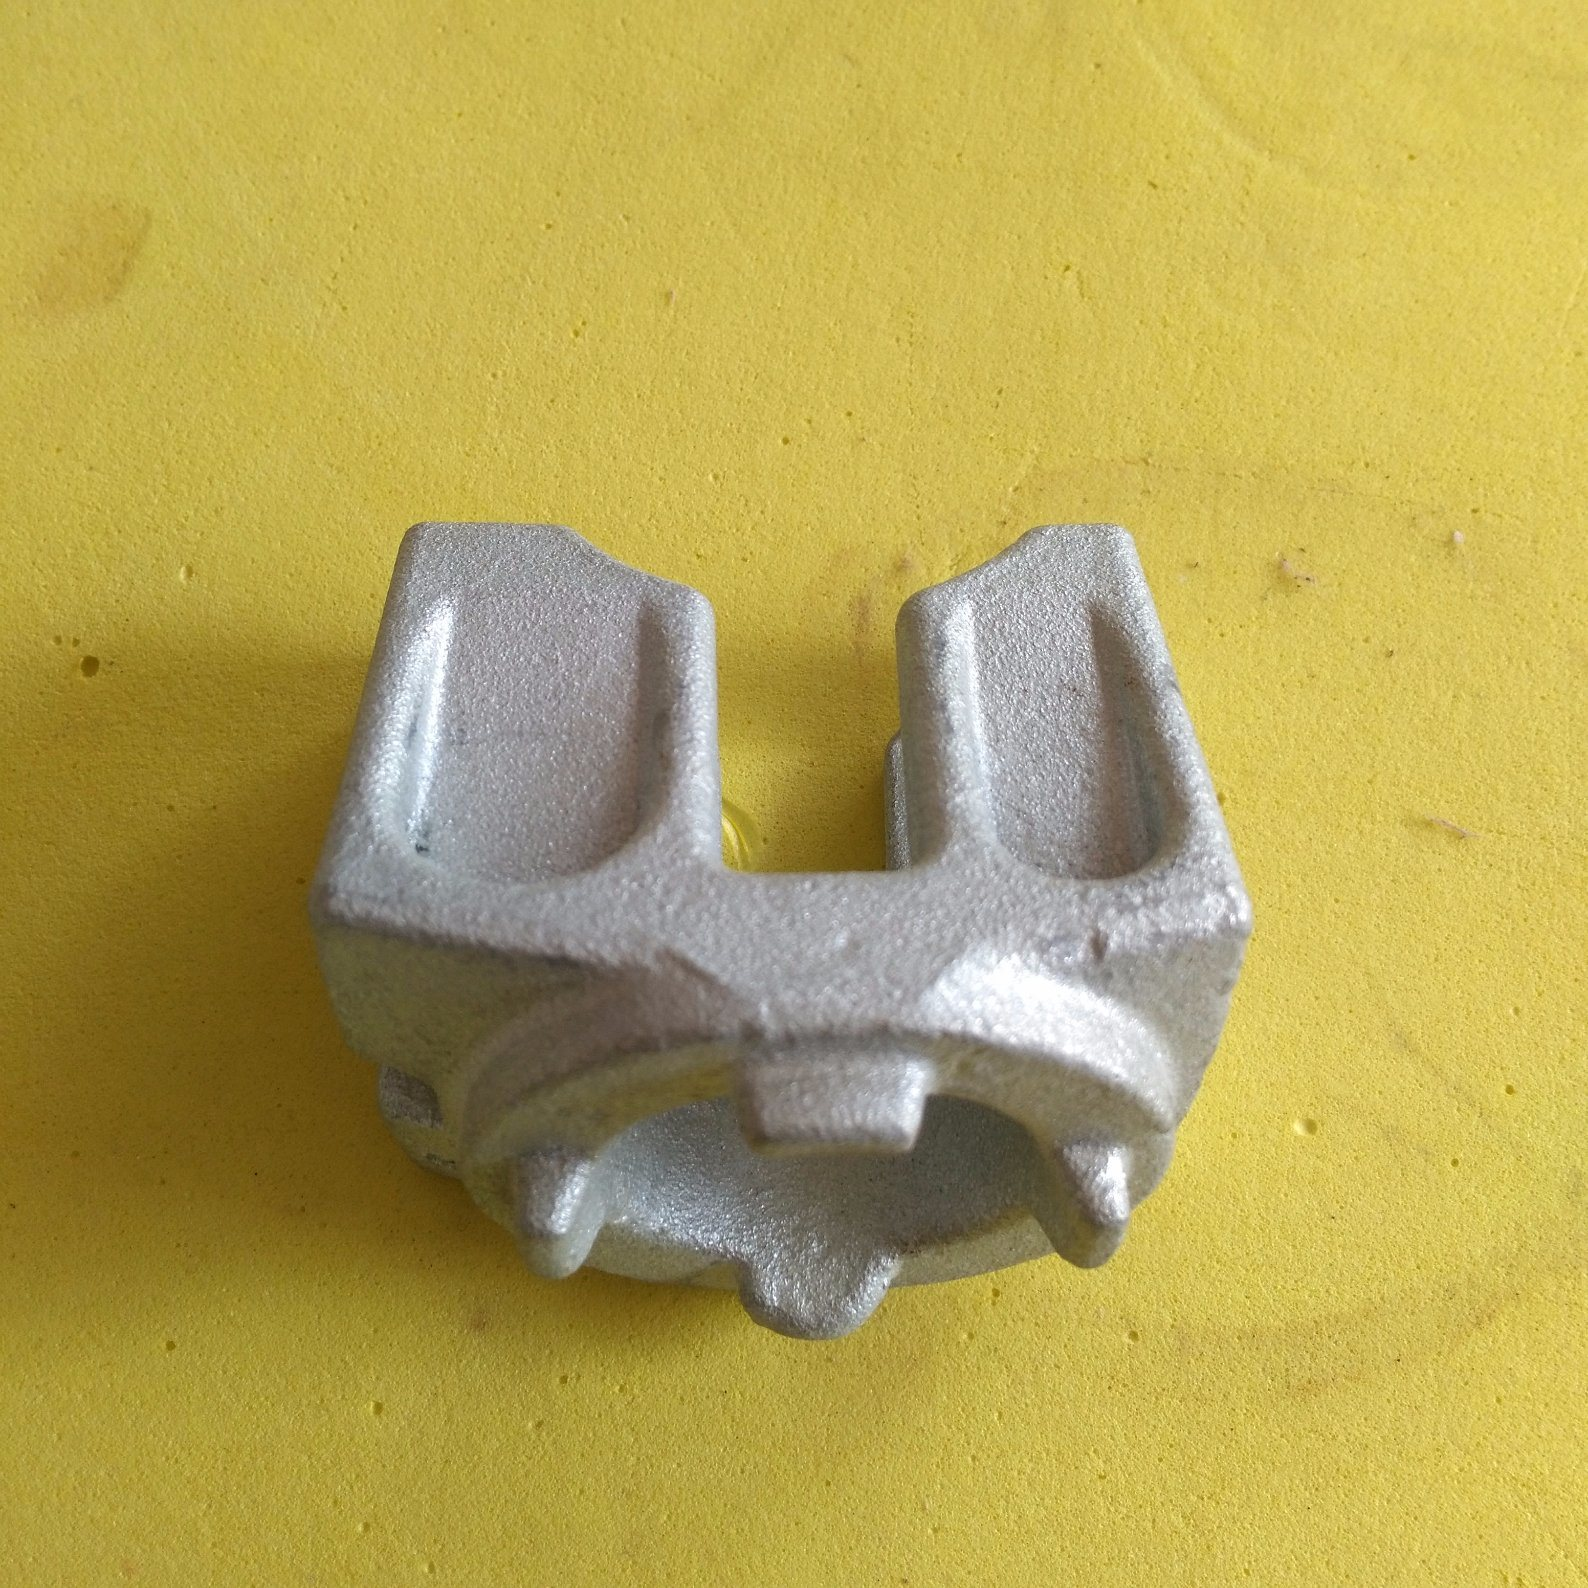 Ringlock Scaffolding Parts/Ledger Head/L/R-Ledger Head